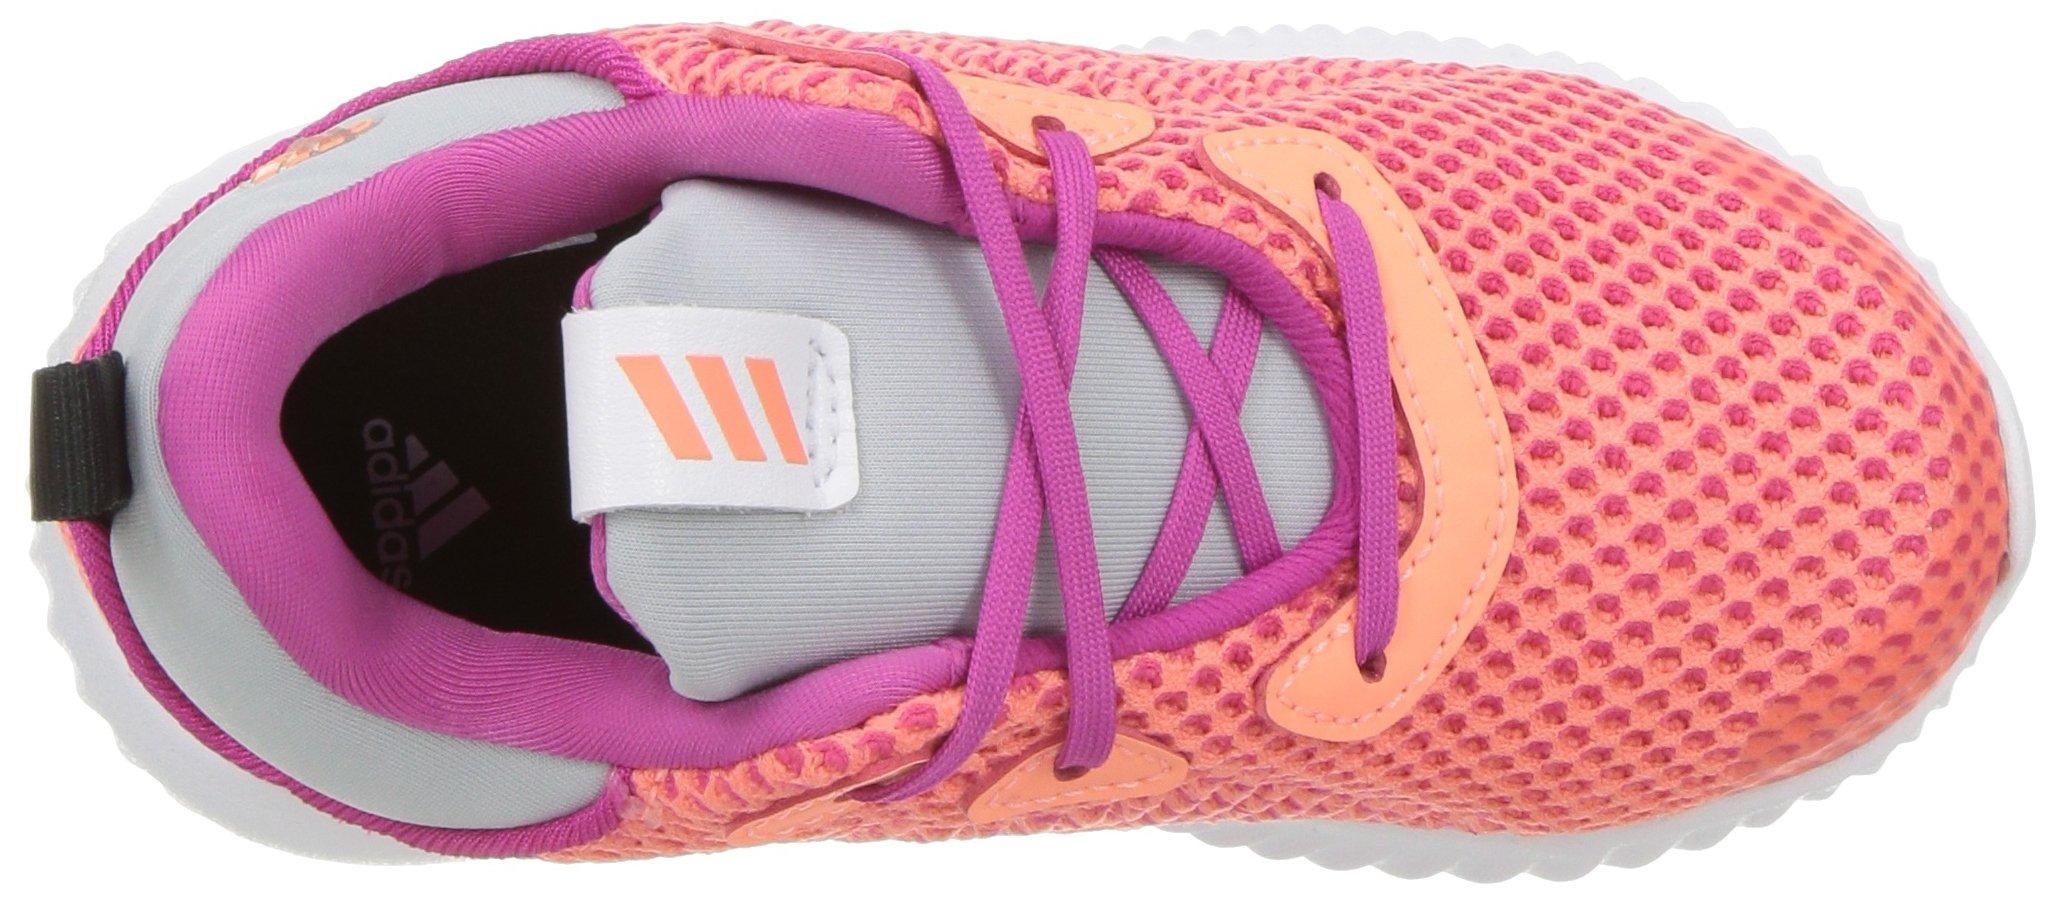 adidas Kids' Alphabounce Running Shoe, Bahia Magenta/Sun Glow/Clear Grey, 4 Medium US Toddler by adidas (Image #8)